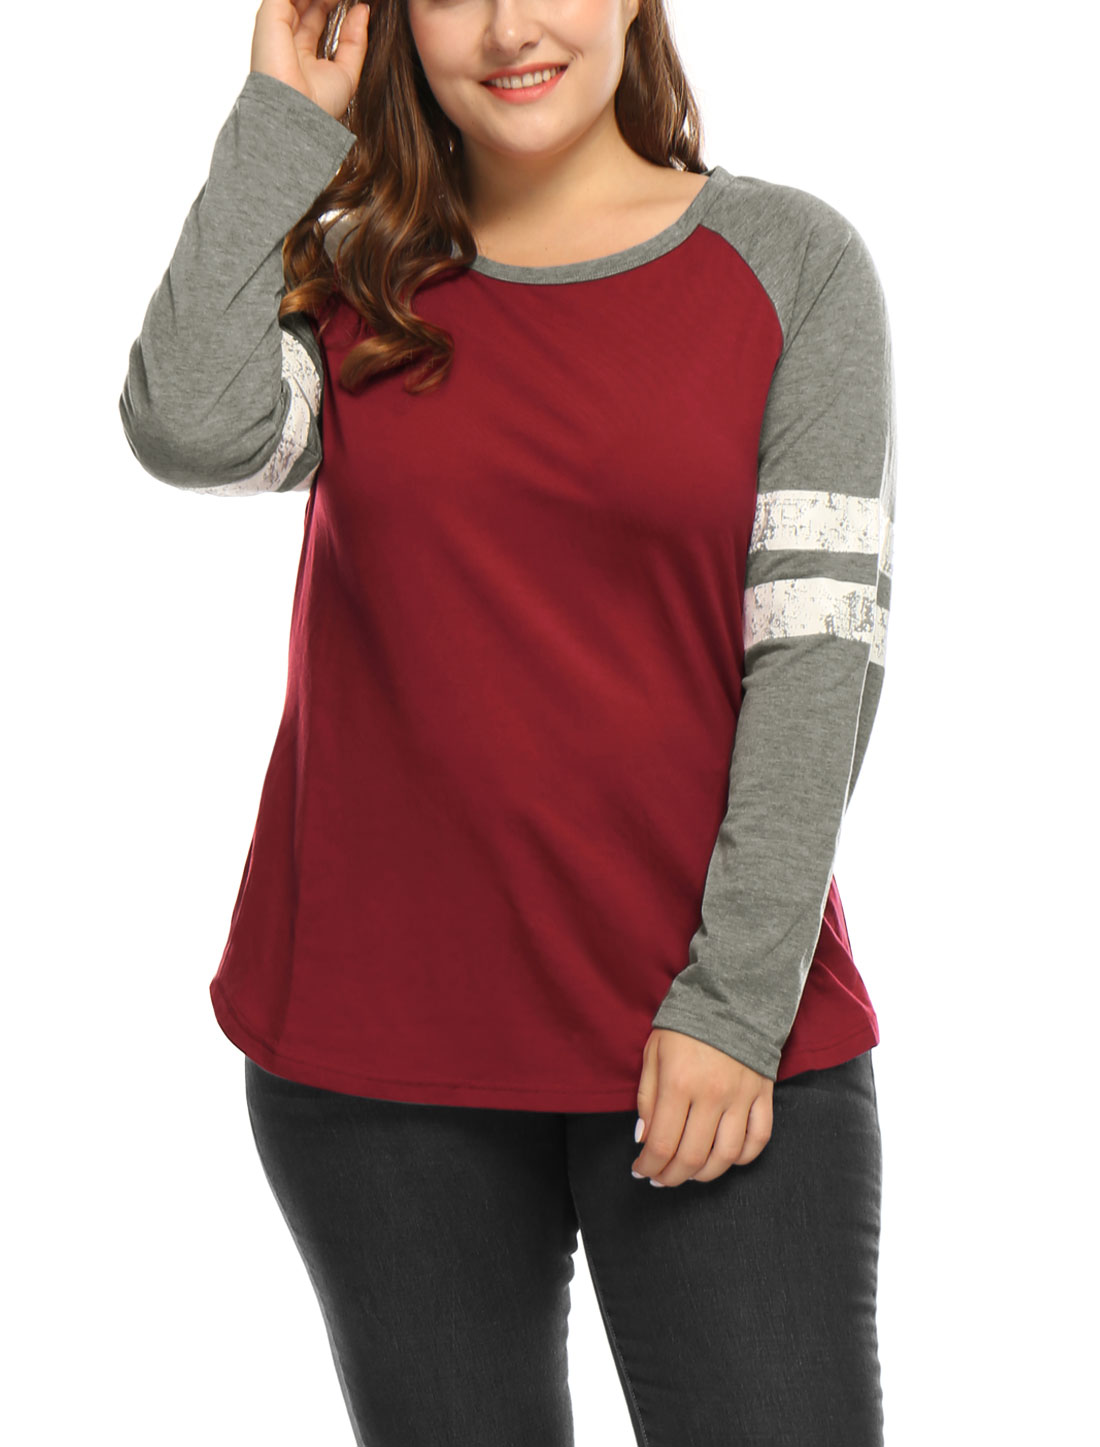 Women Plus Size Color Block Varsity-Striped Raglan Baseball T-Shirt Red 1X